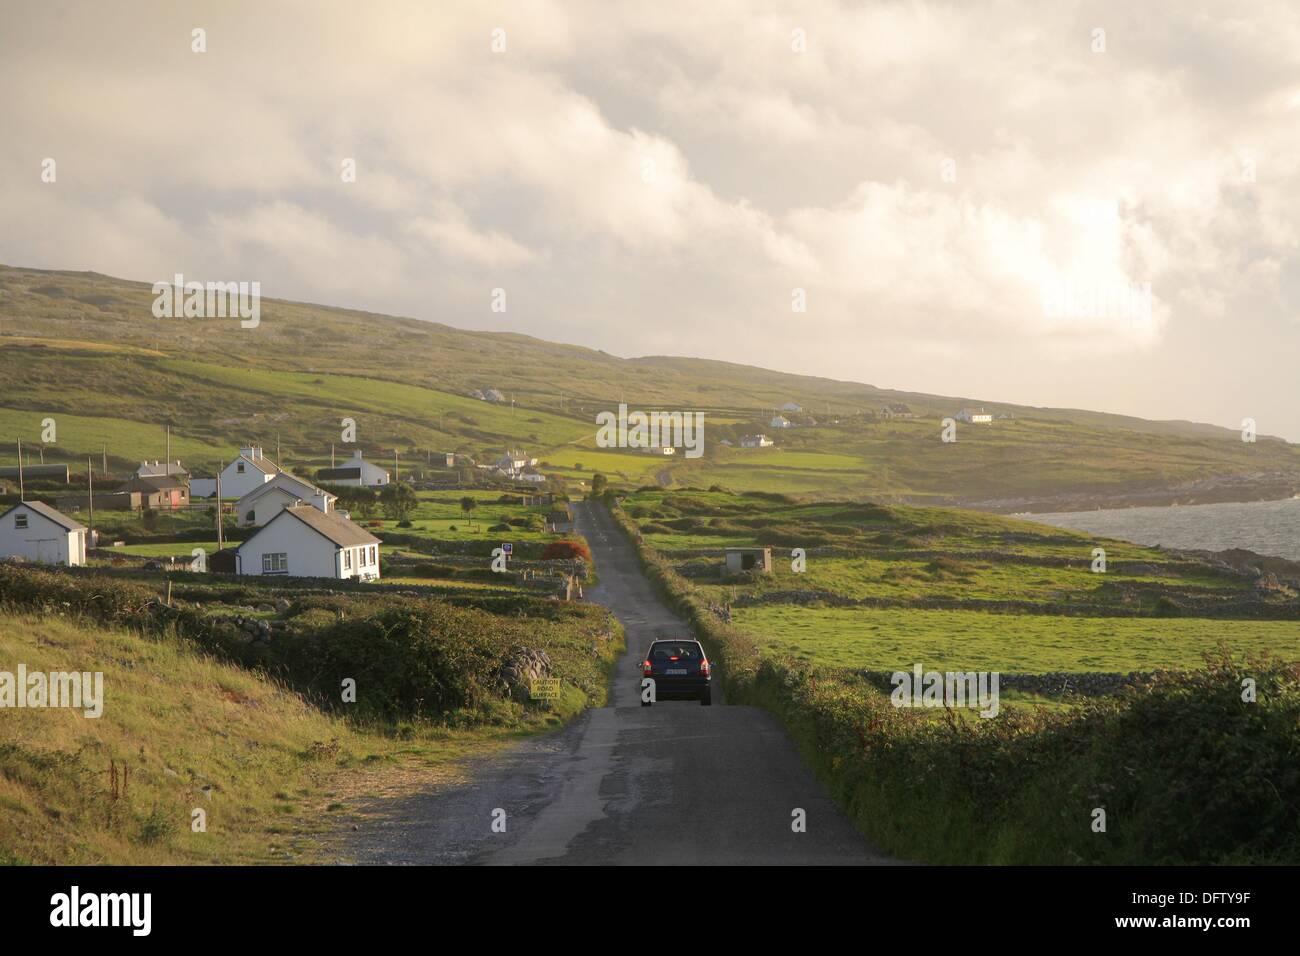 Road to Fanore, Burren coastline, Ireland - Stock Image